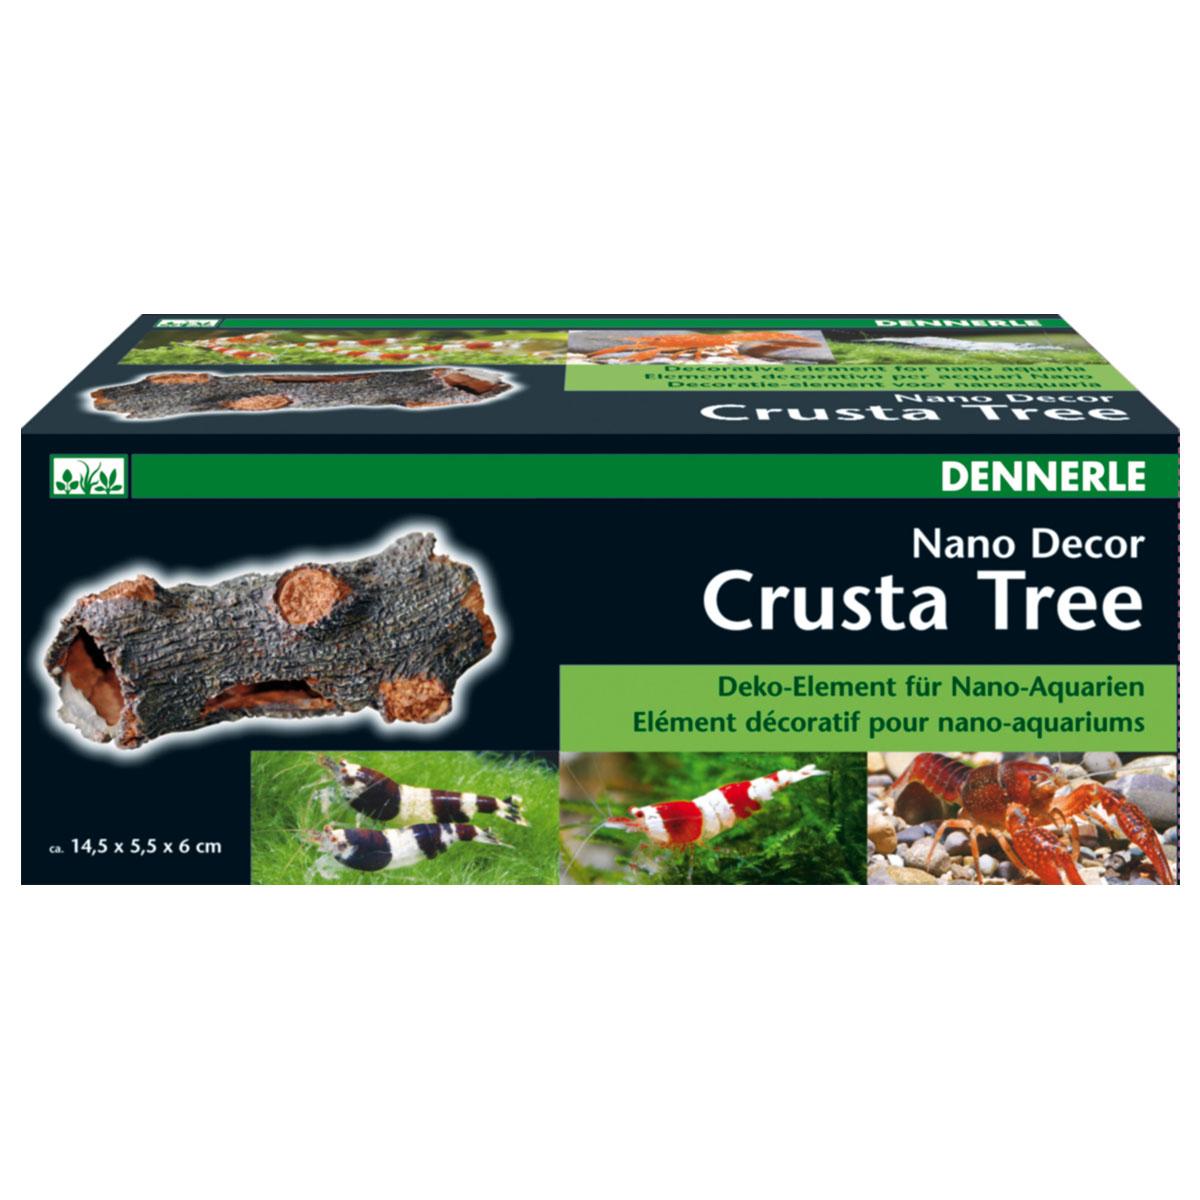 Dennerle nano decor crusta tree s g nstig kaufen bei zooroyal - Nano aquarium deko ...